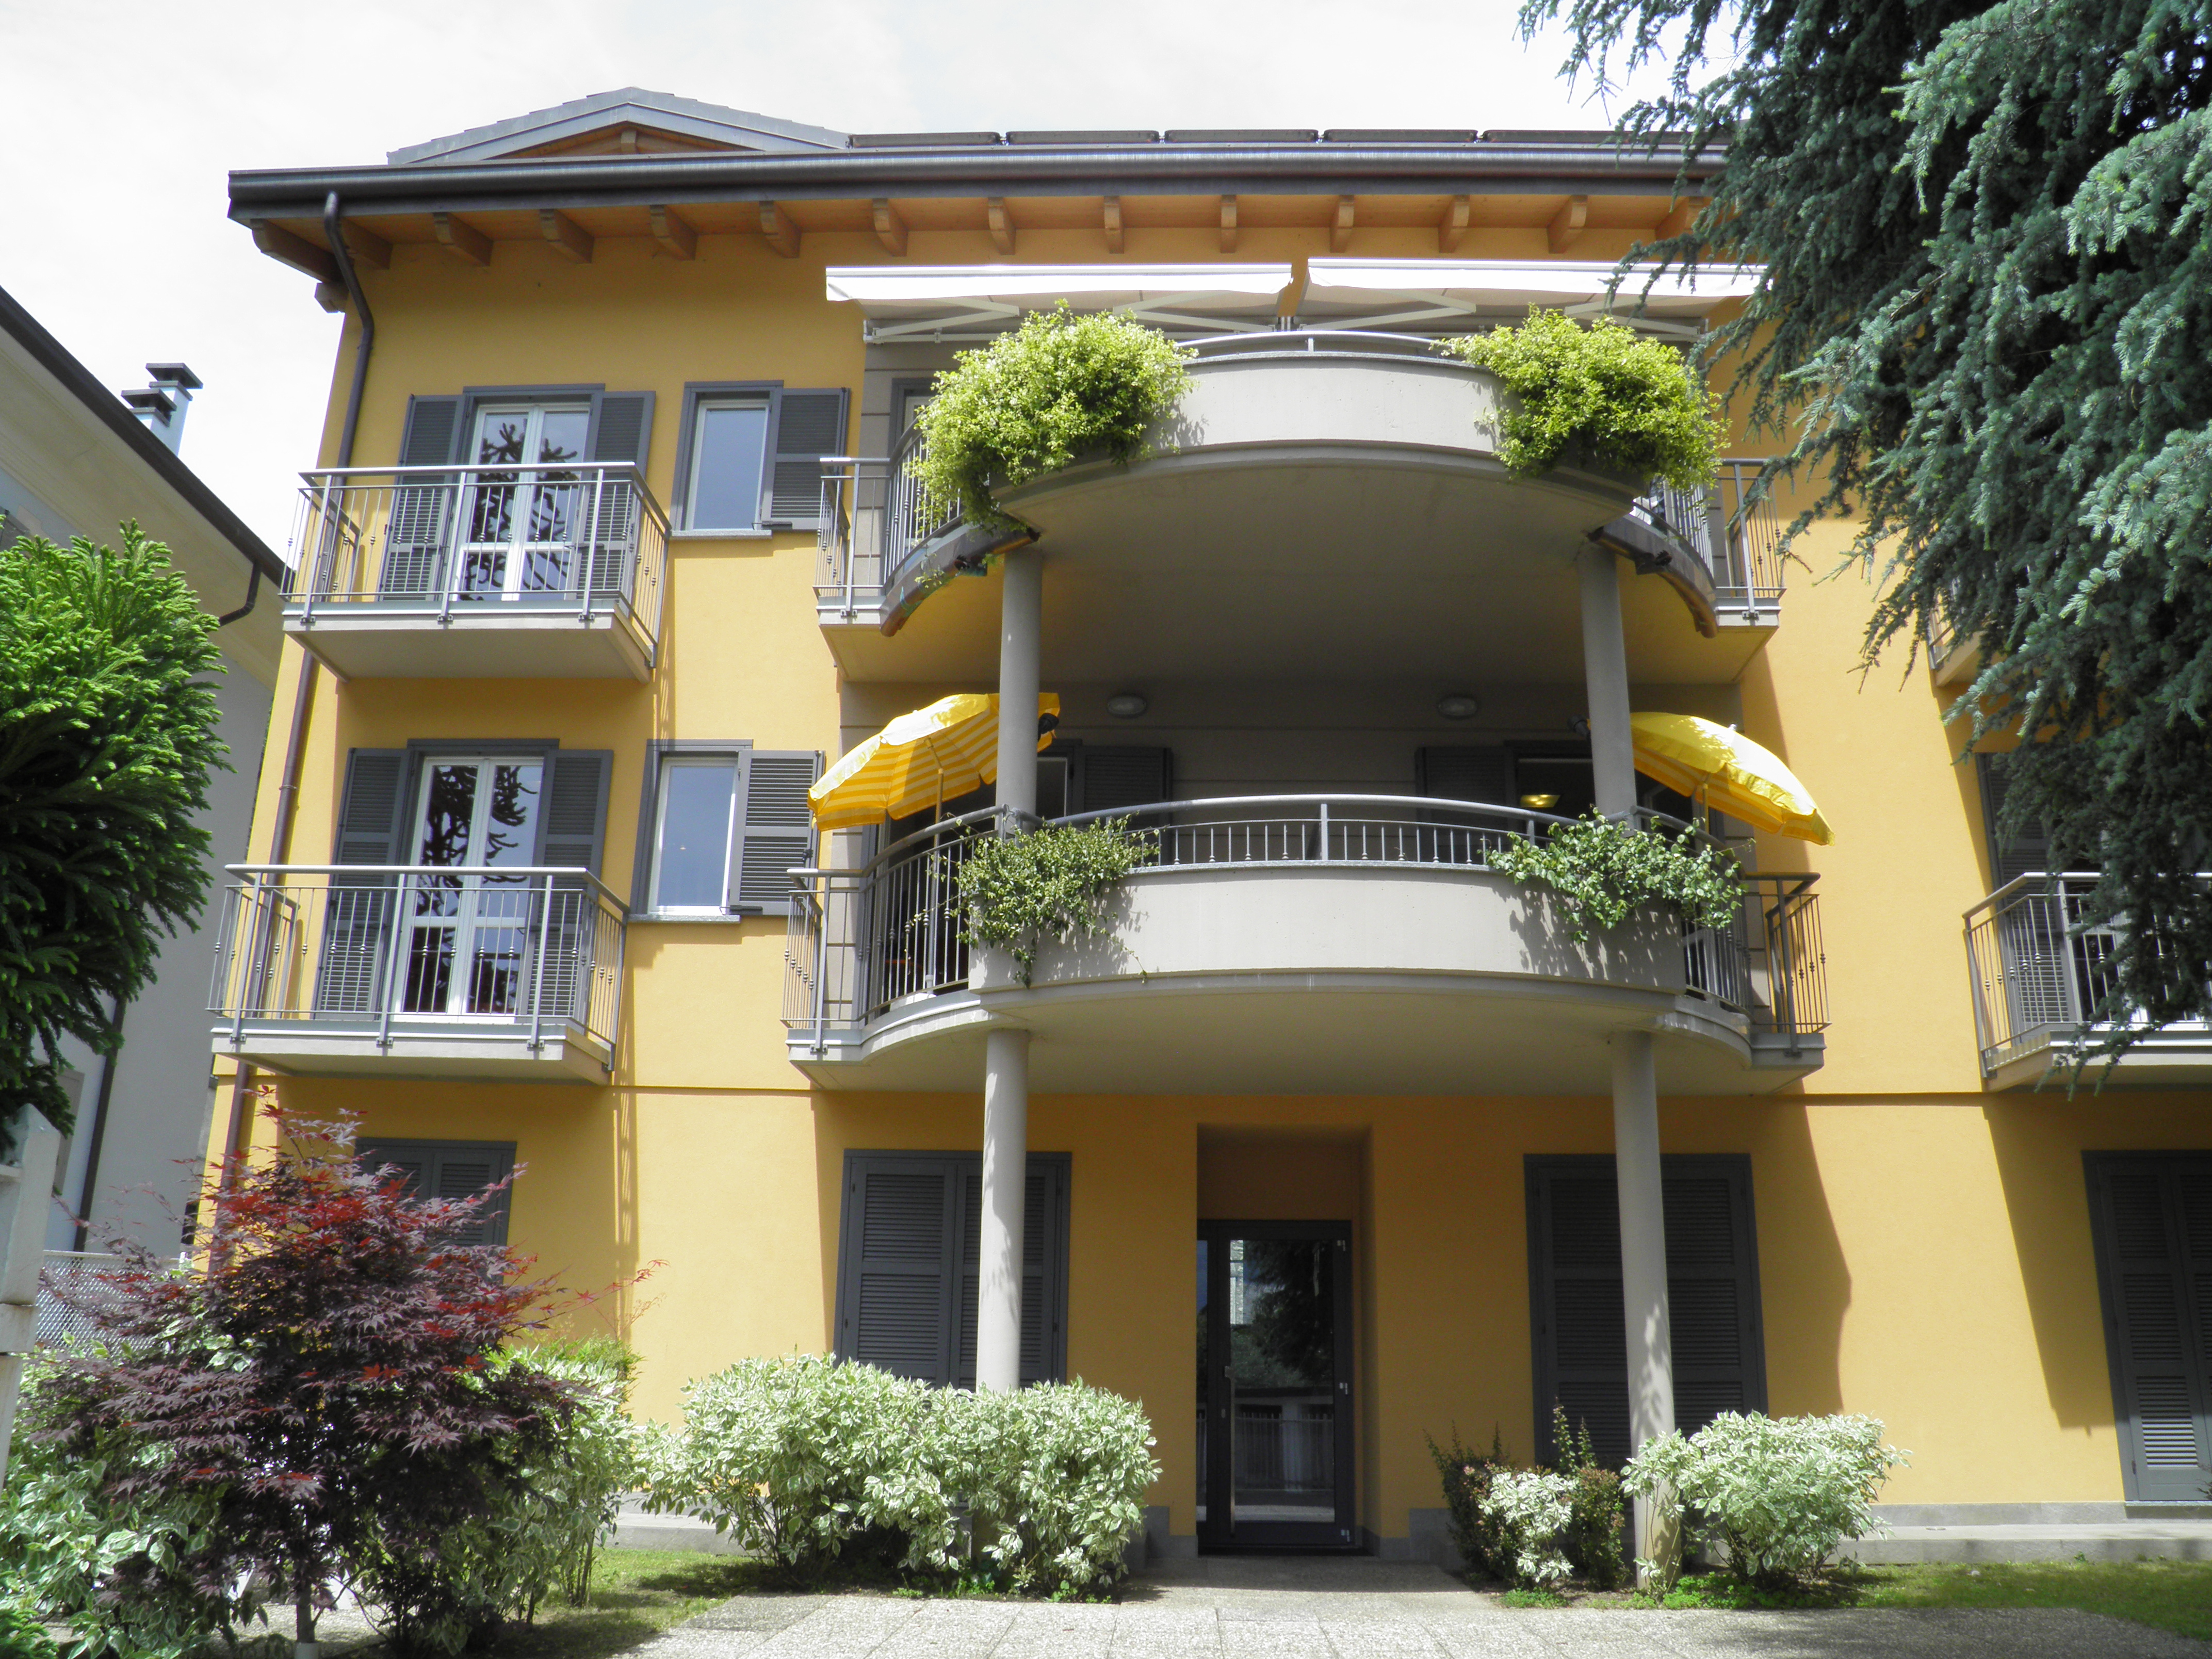 Bilder von Lake Como Apartment Cedro_207_Domaso_55_Haus